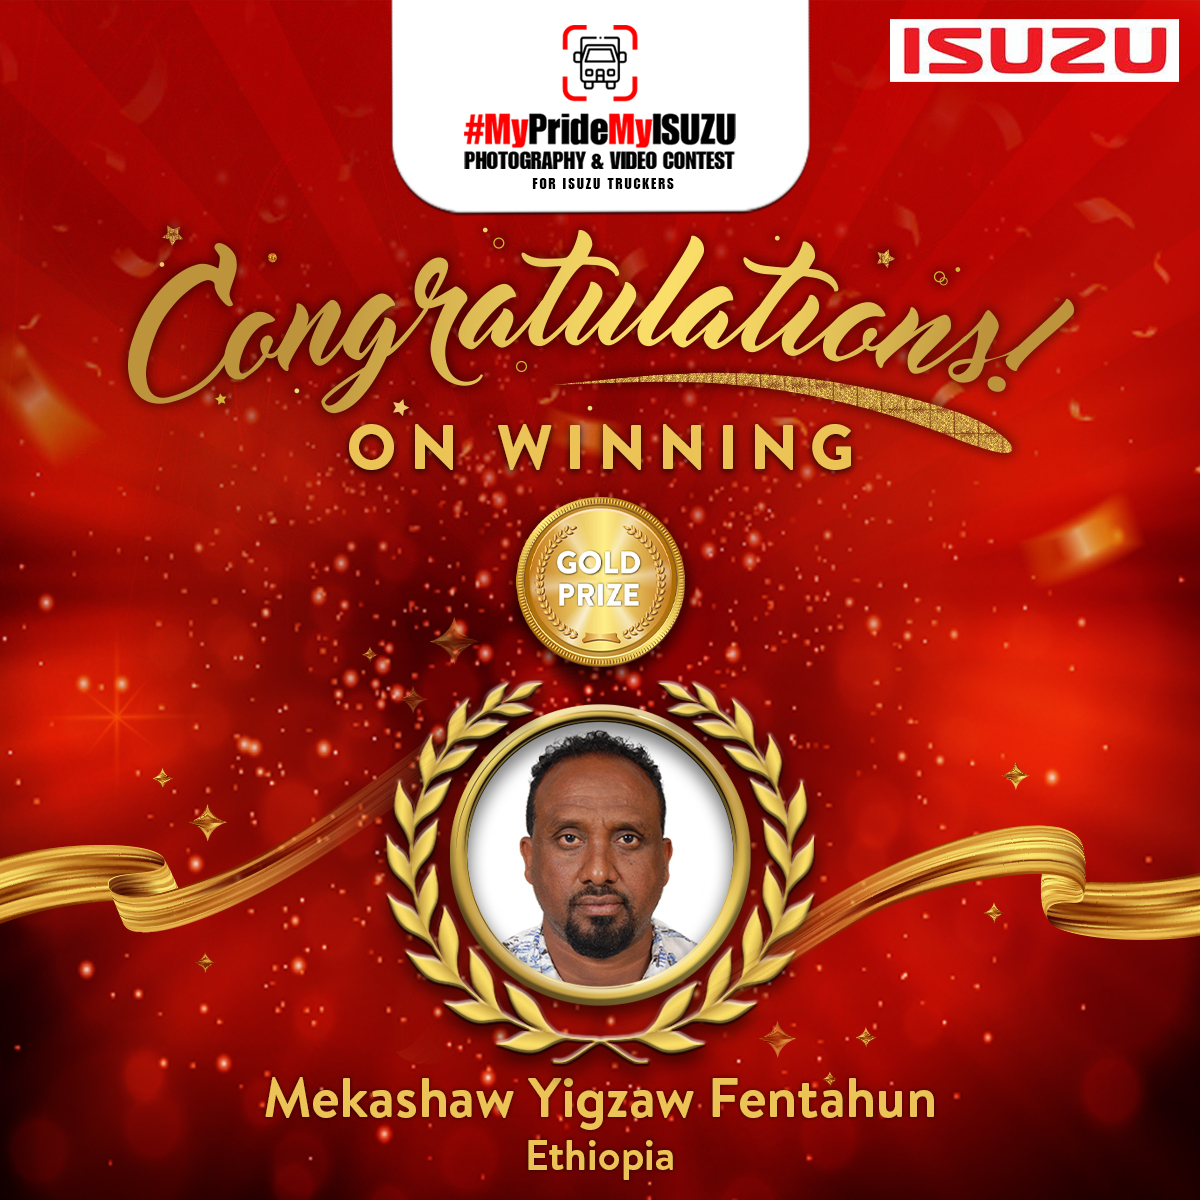 Gold Prize Winner - #MyPrideMyISUZU Mekashaw